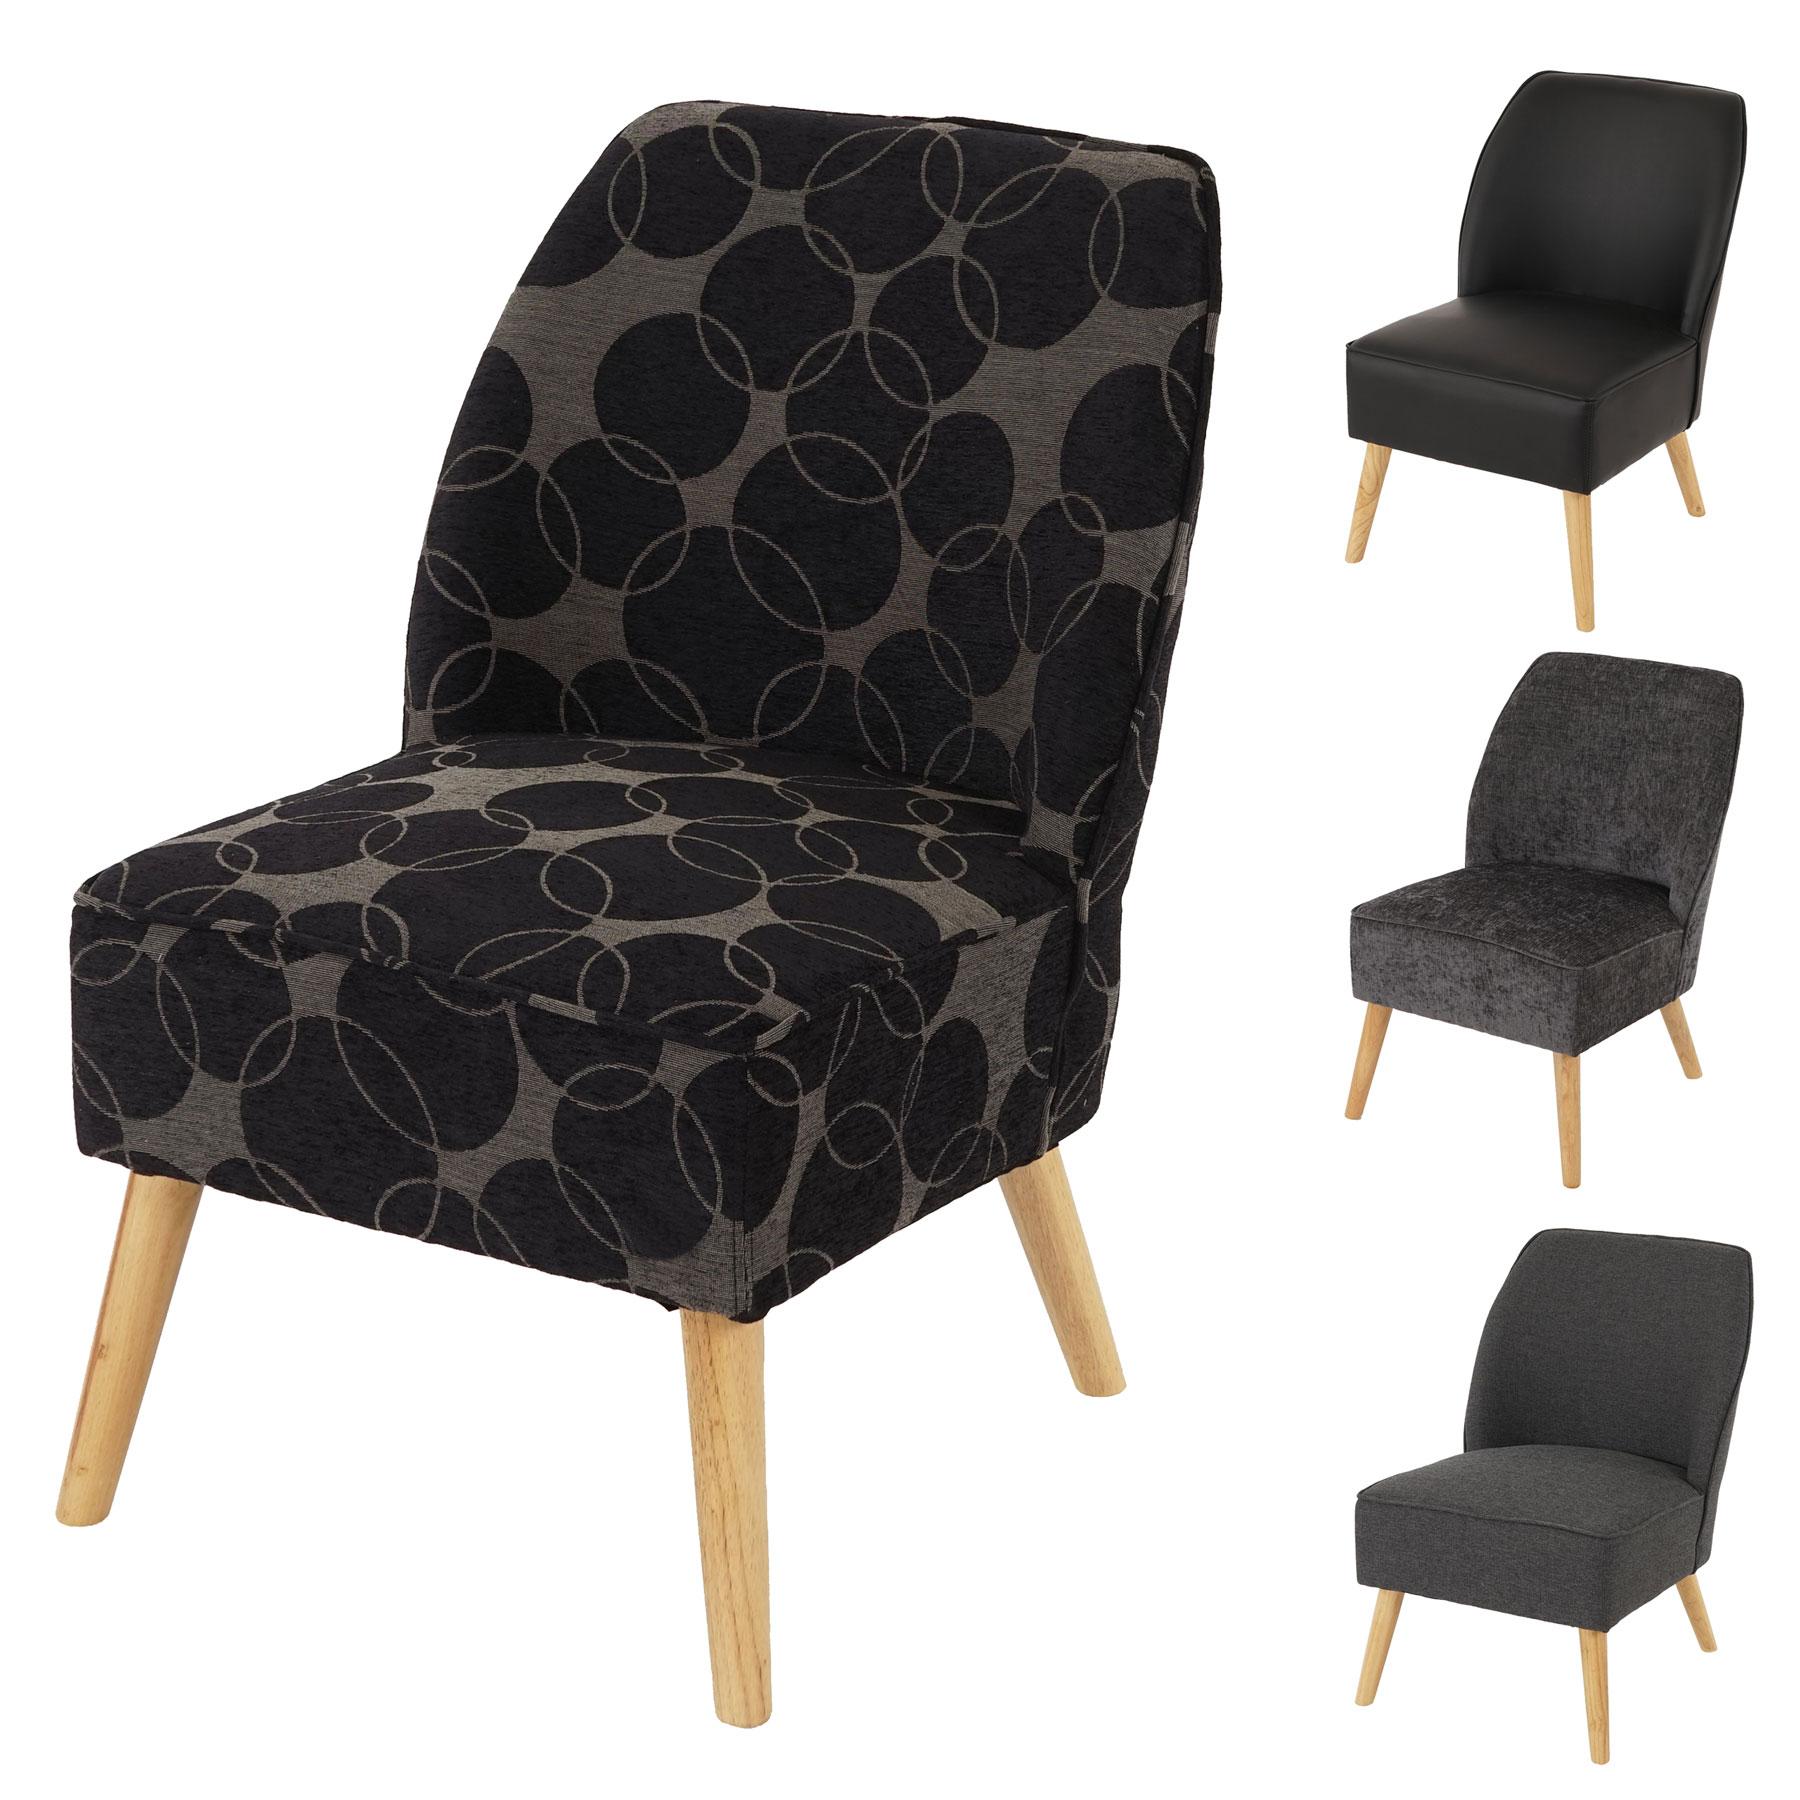 sessel malm t312 loungesessel polstersessel retro 50er. Black Bedroom Furniture Sets. Home Design Ideas